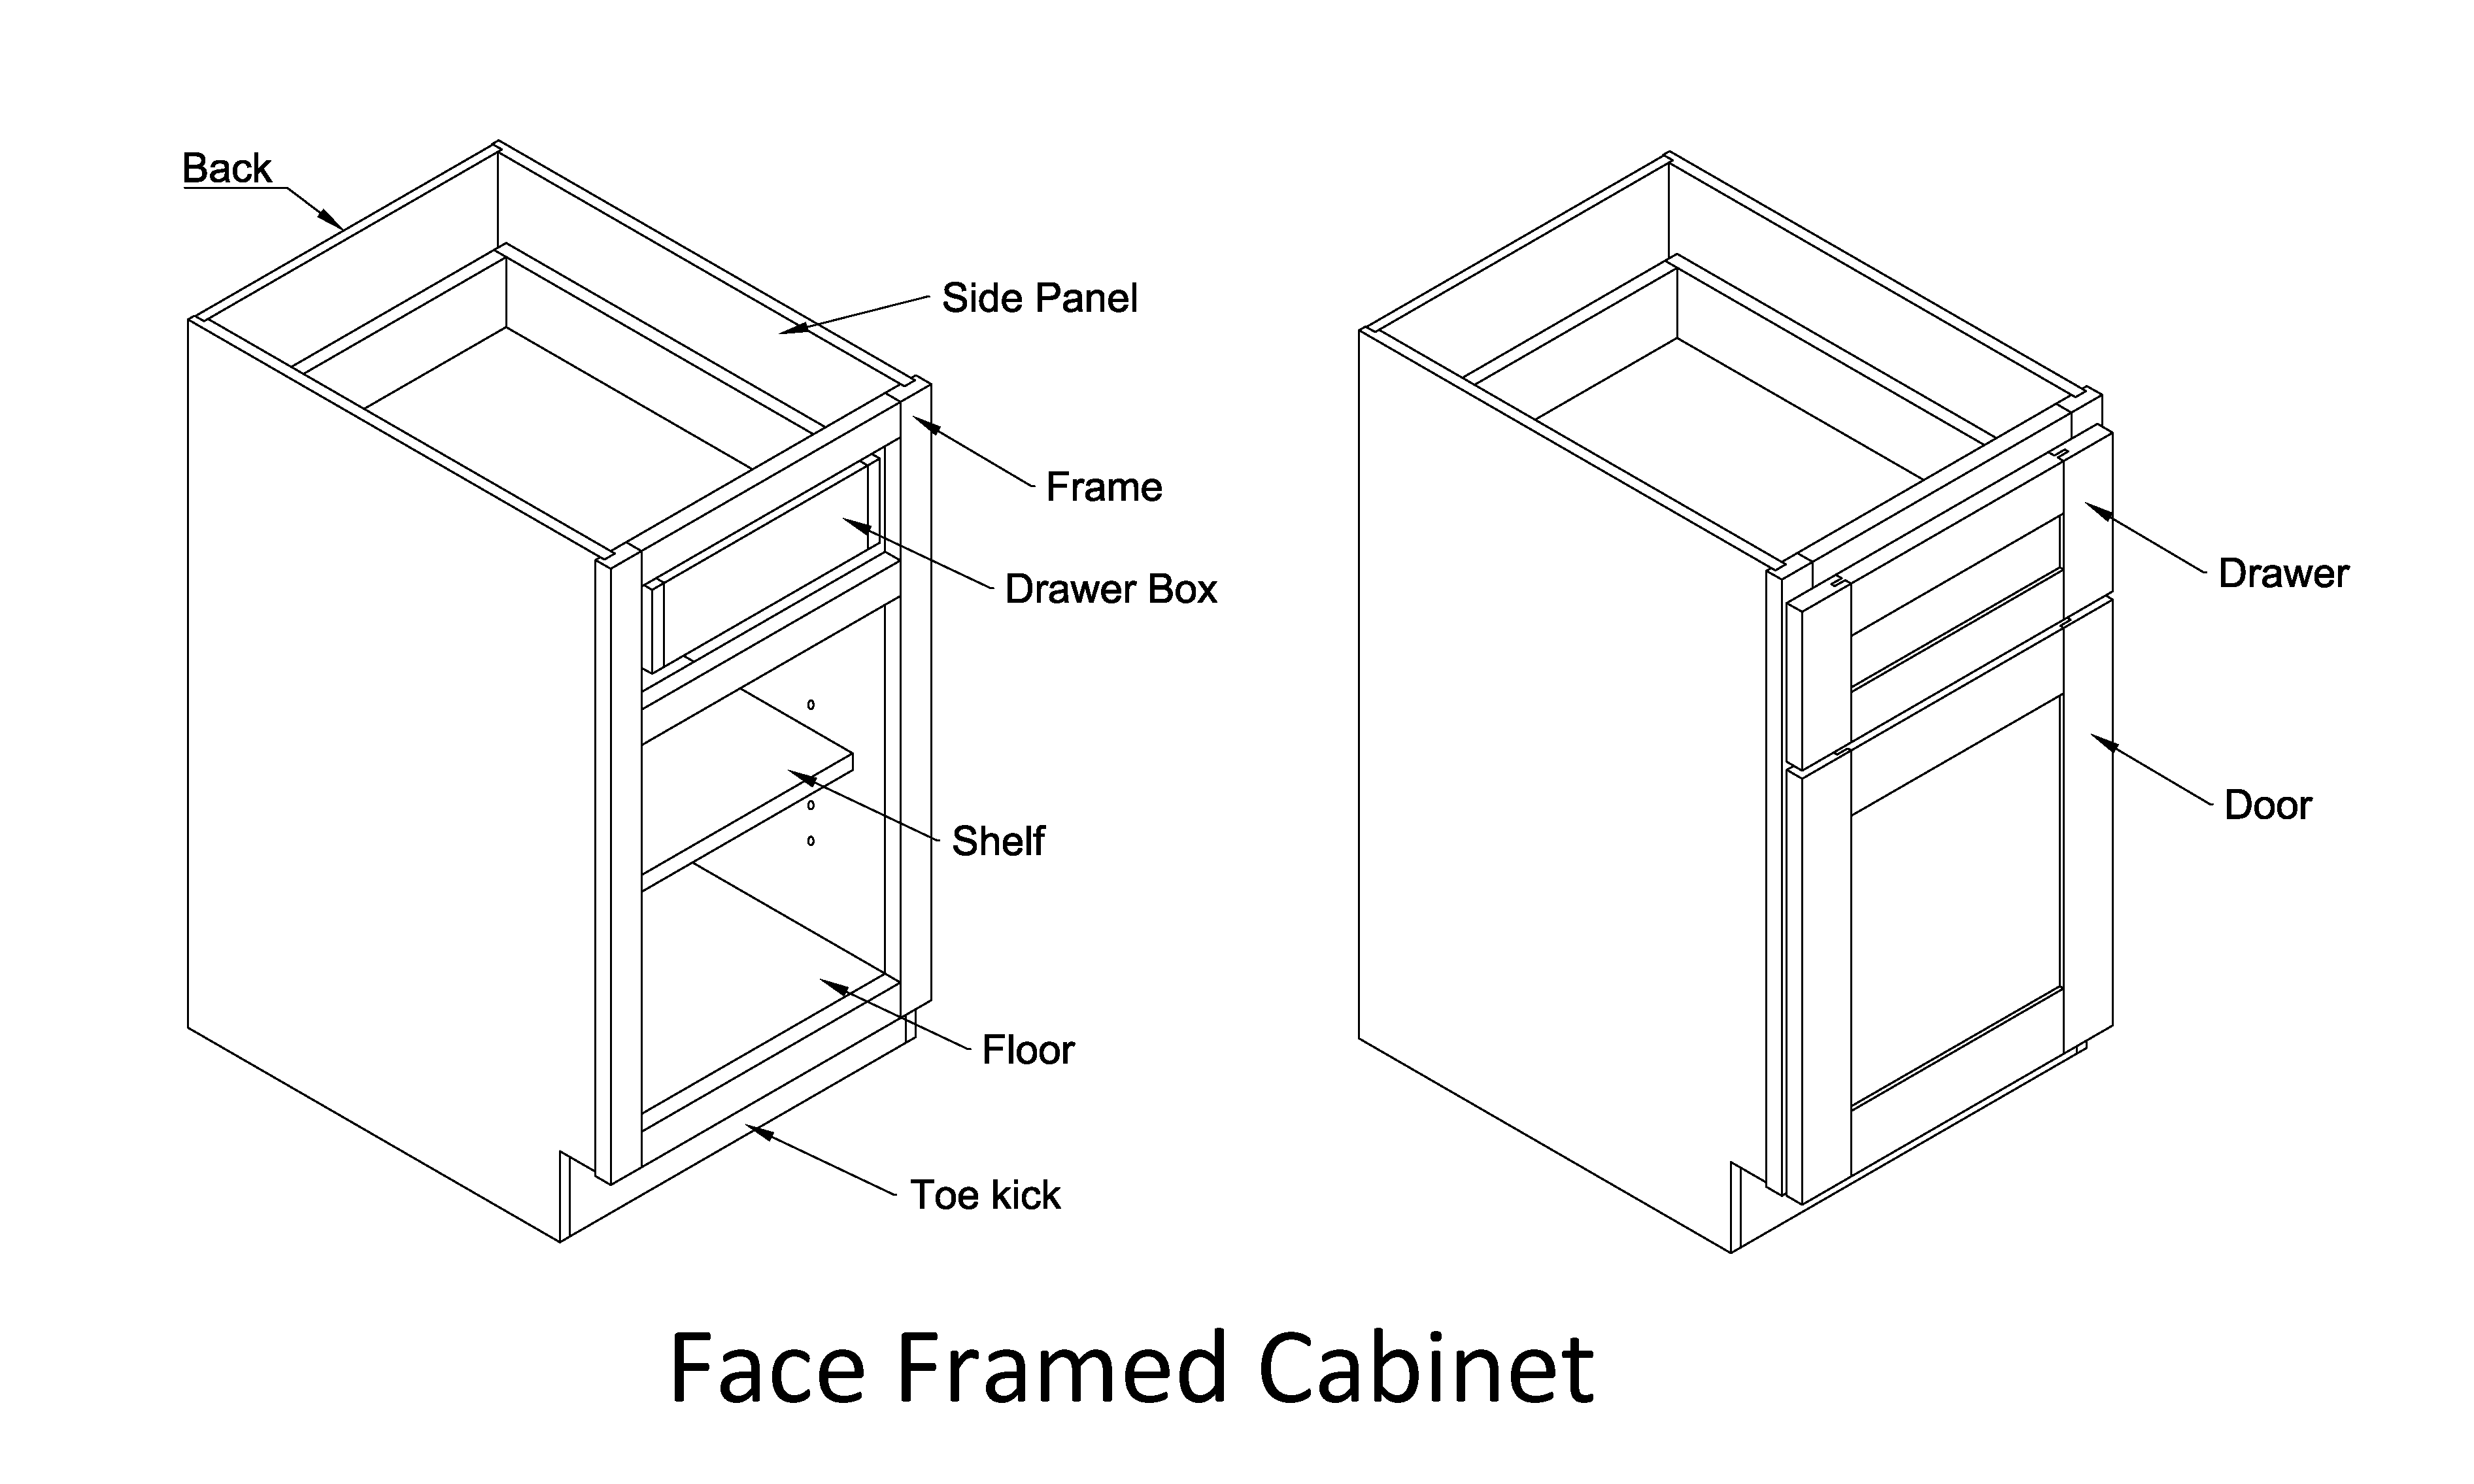 face framed cabinet,wooden kitchen cabinet,modular kitchen,chinese cabinet supplier